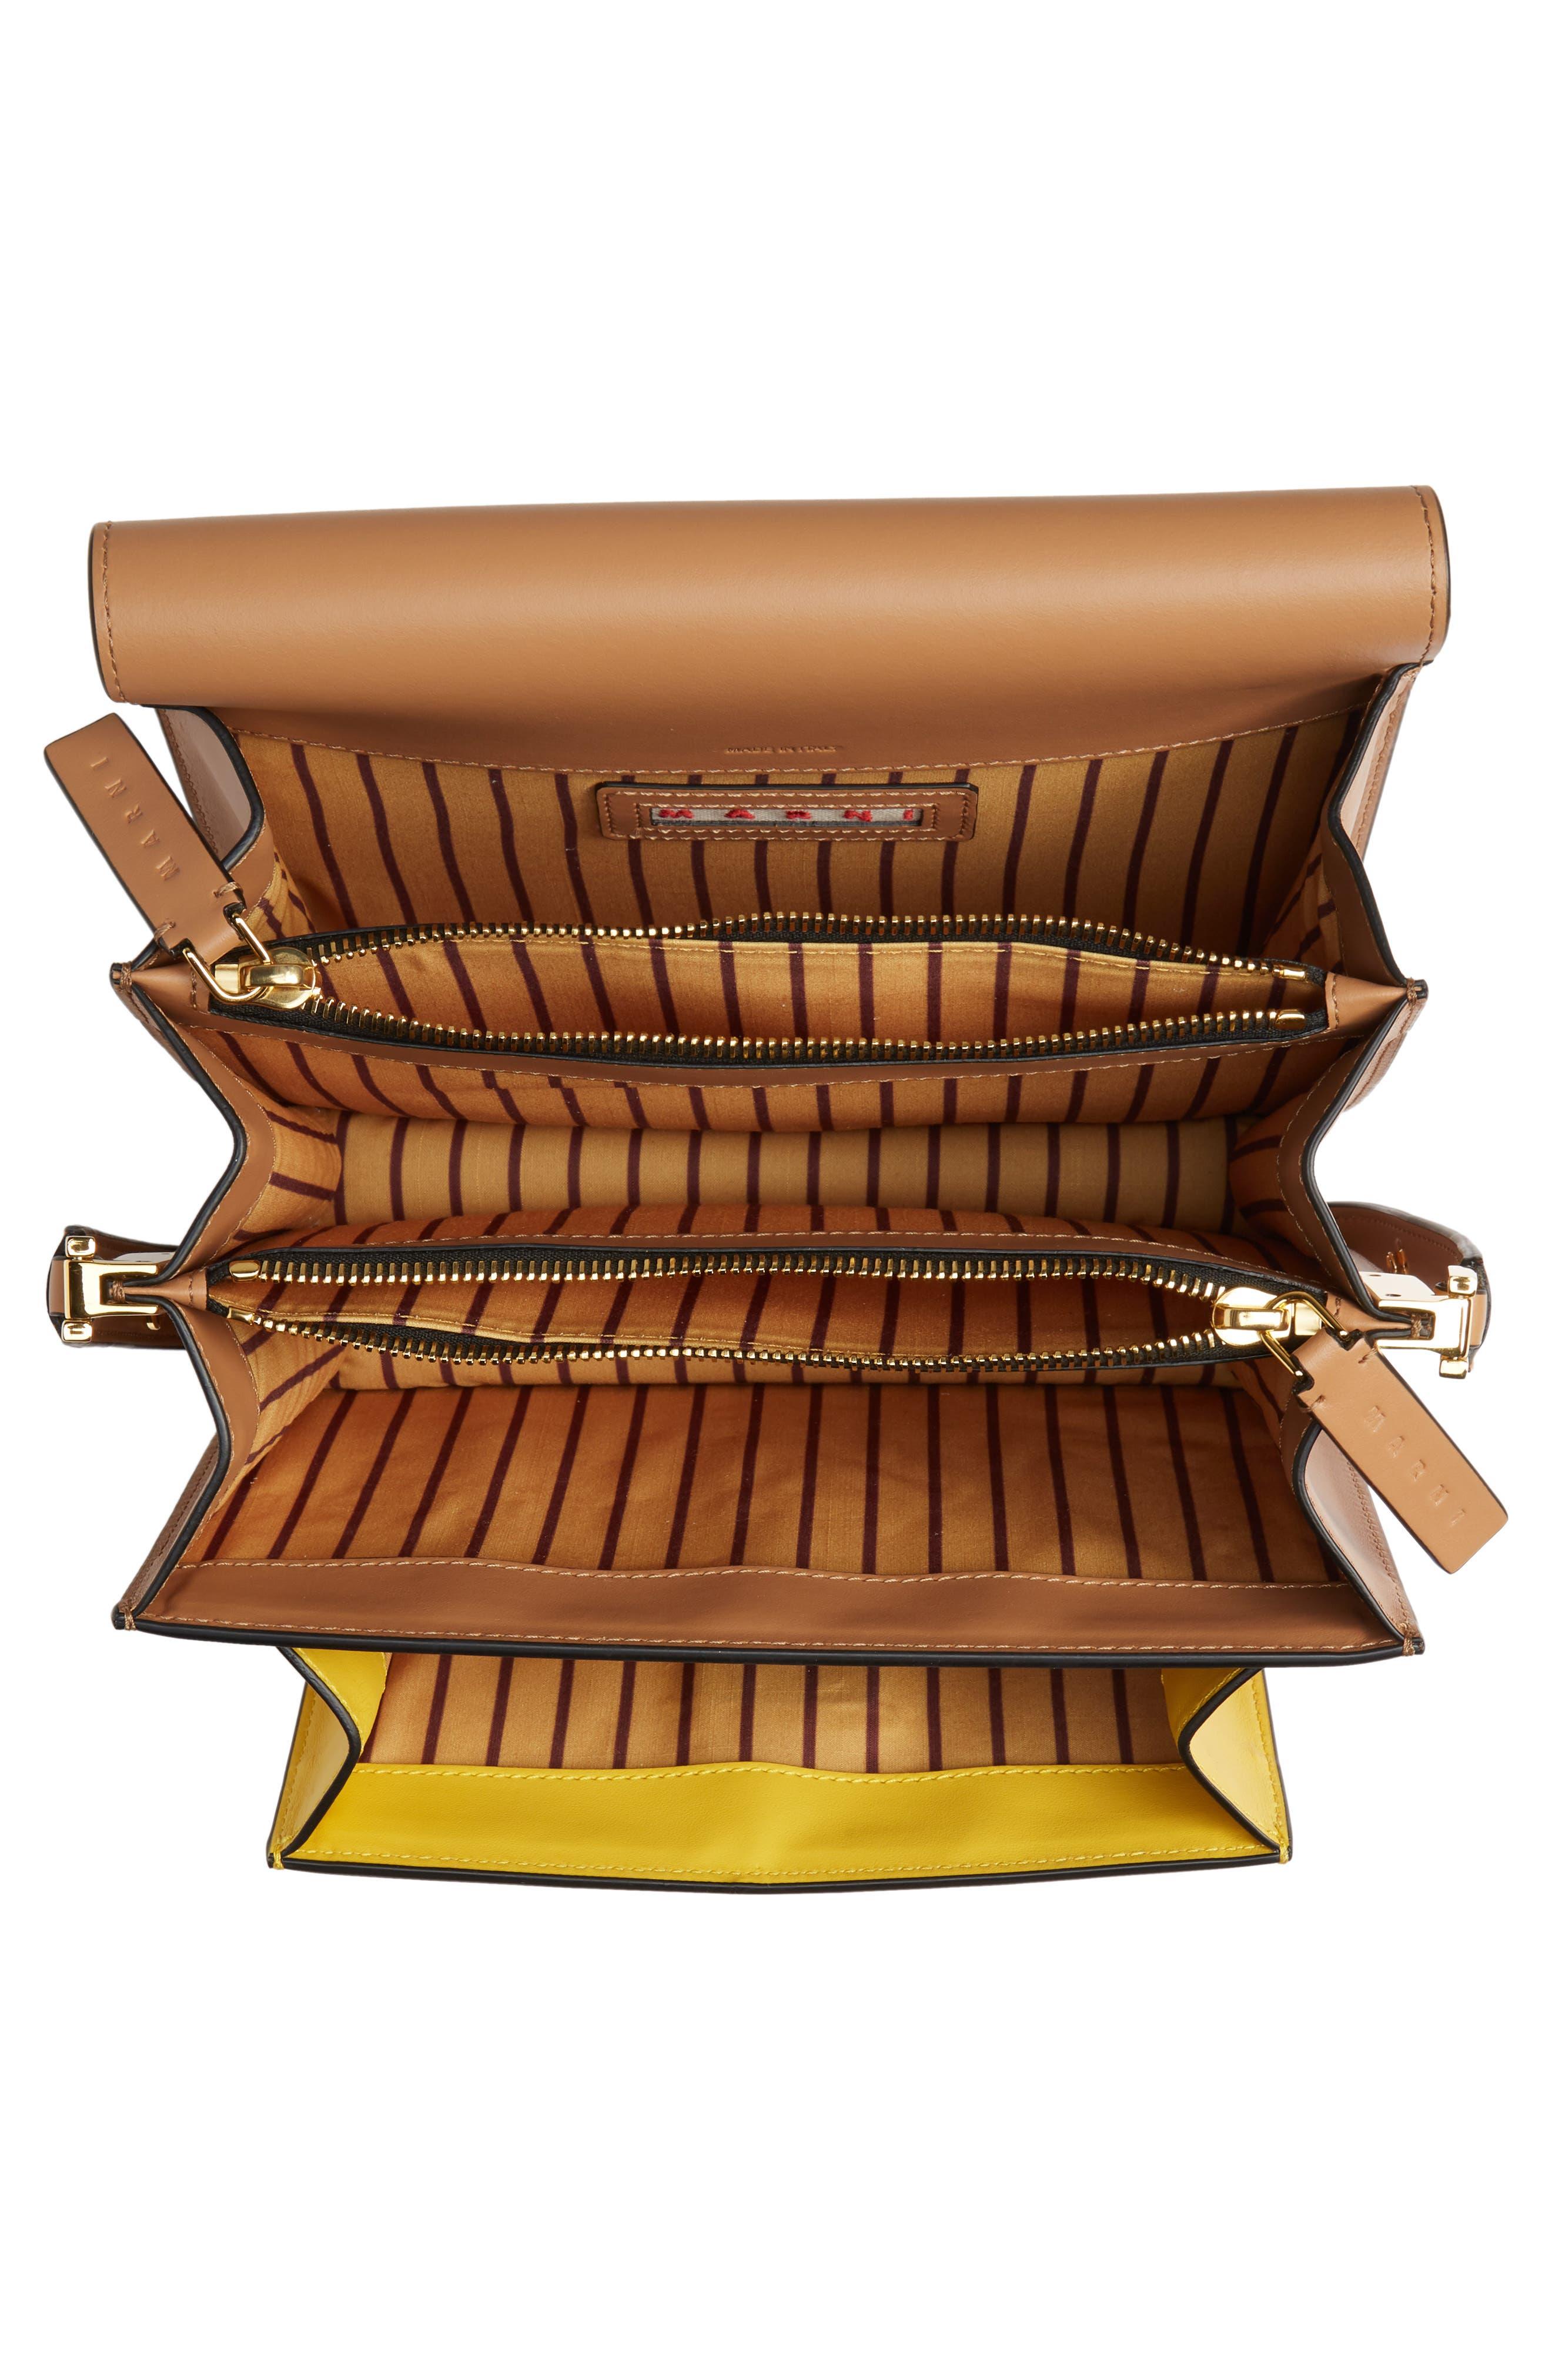 MARNI,                             Trunk Colorblock Leather Shoulder Bag,                             Alternate thumbnail 4, color,                             QUARTZ/ SUNO/ POMPEII